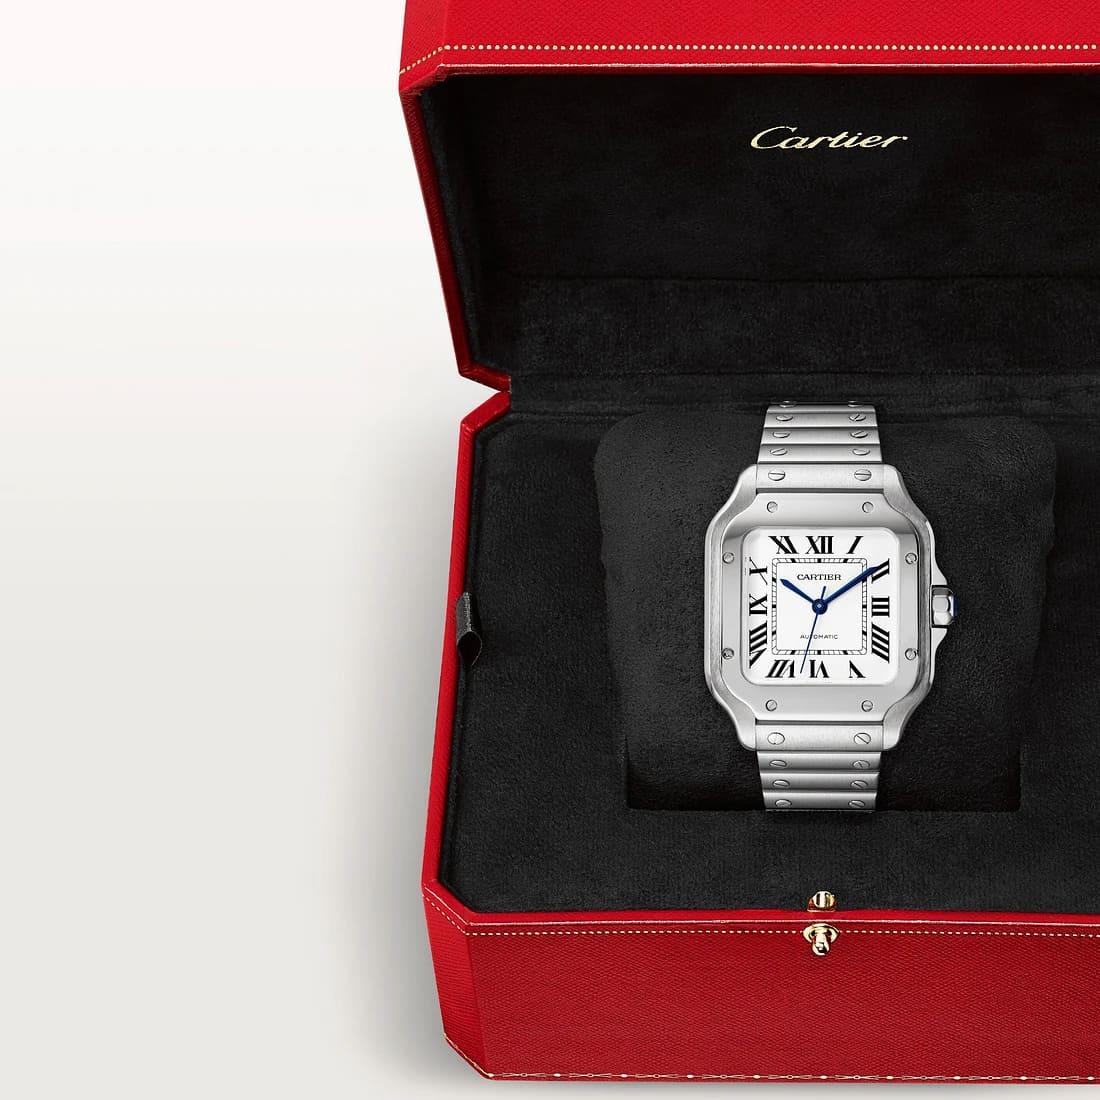 Santos de Cartier in Verkaufsbox